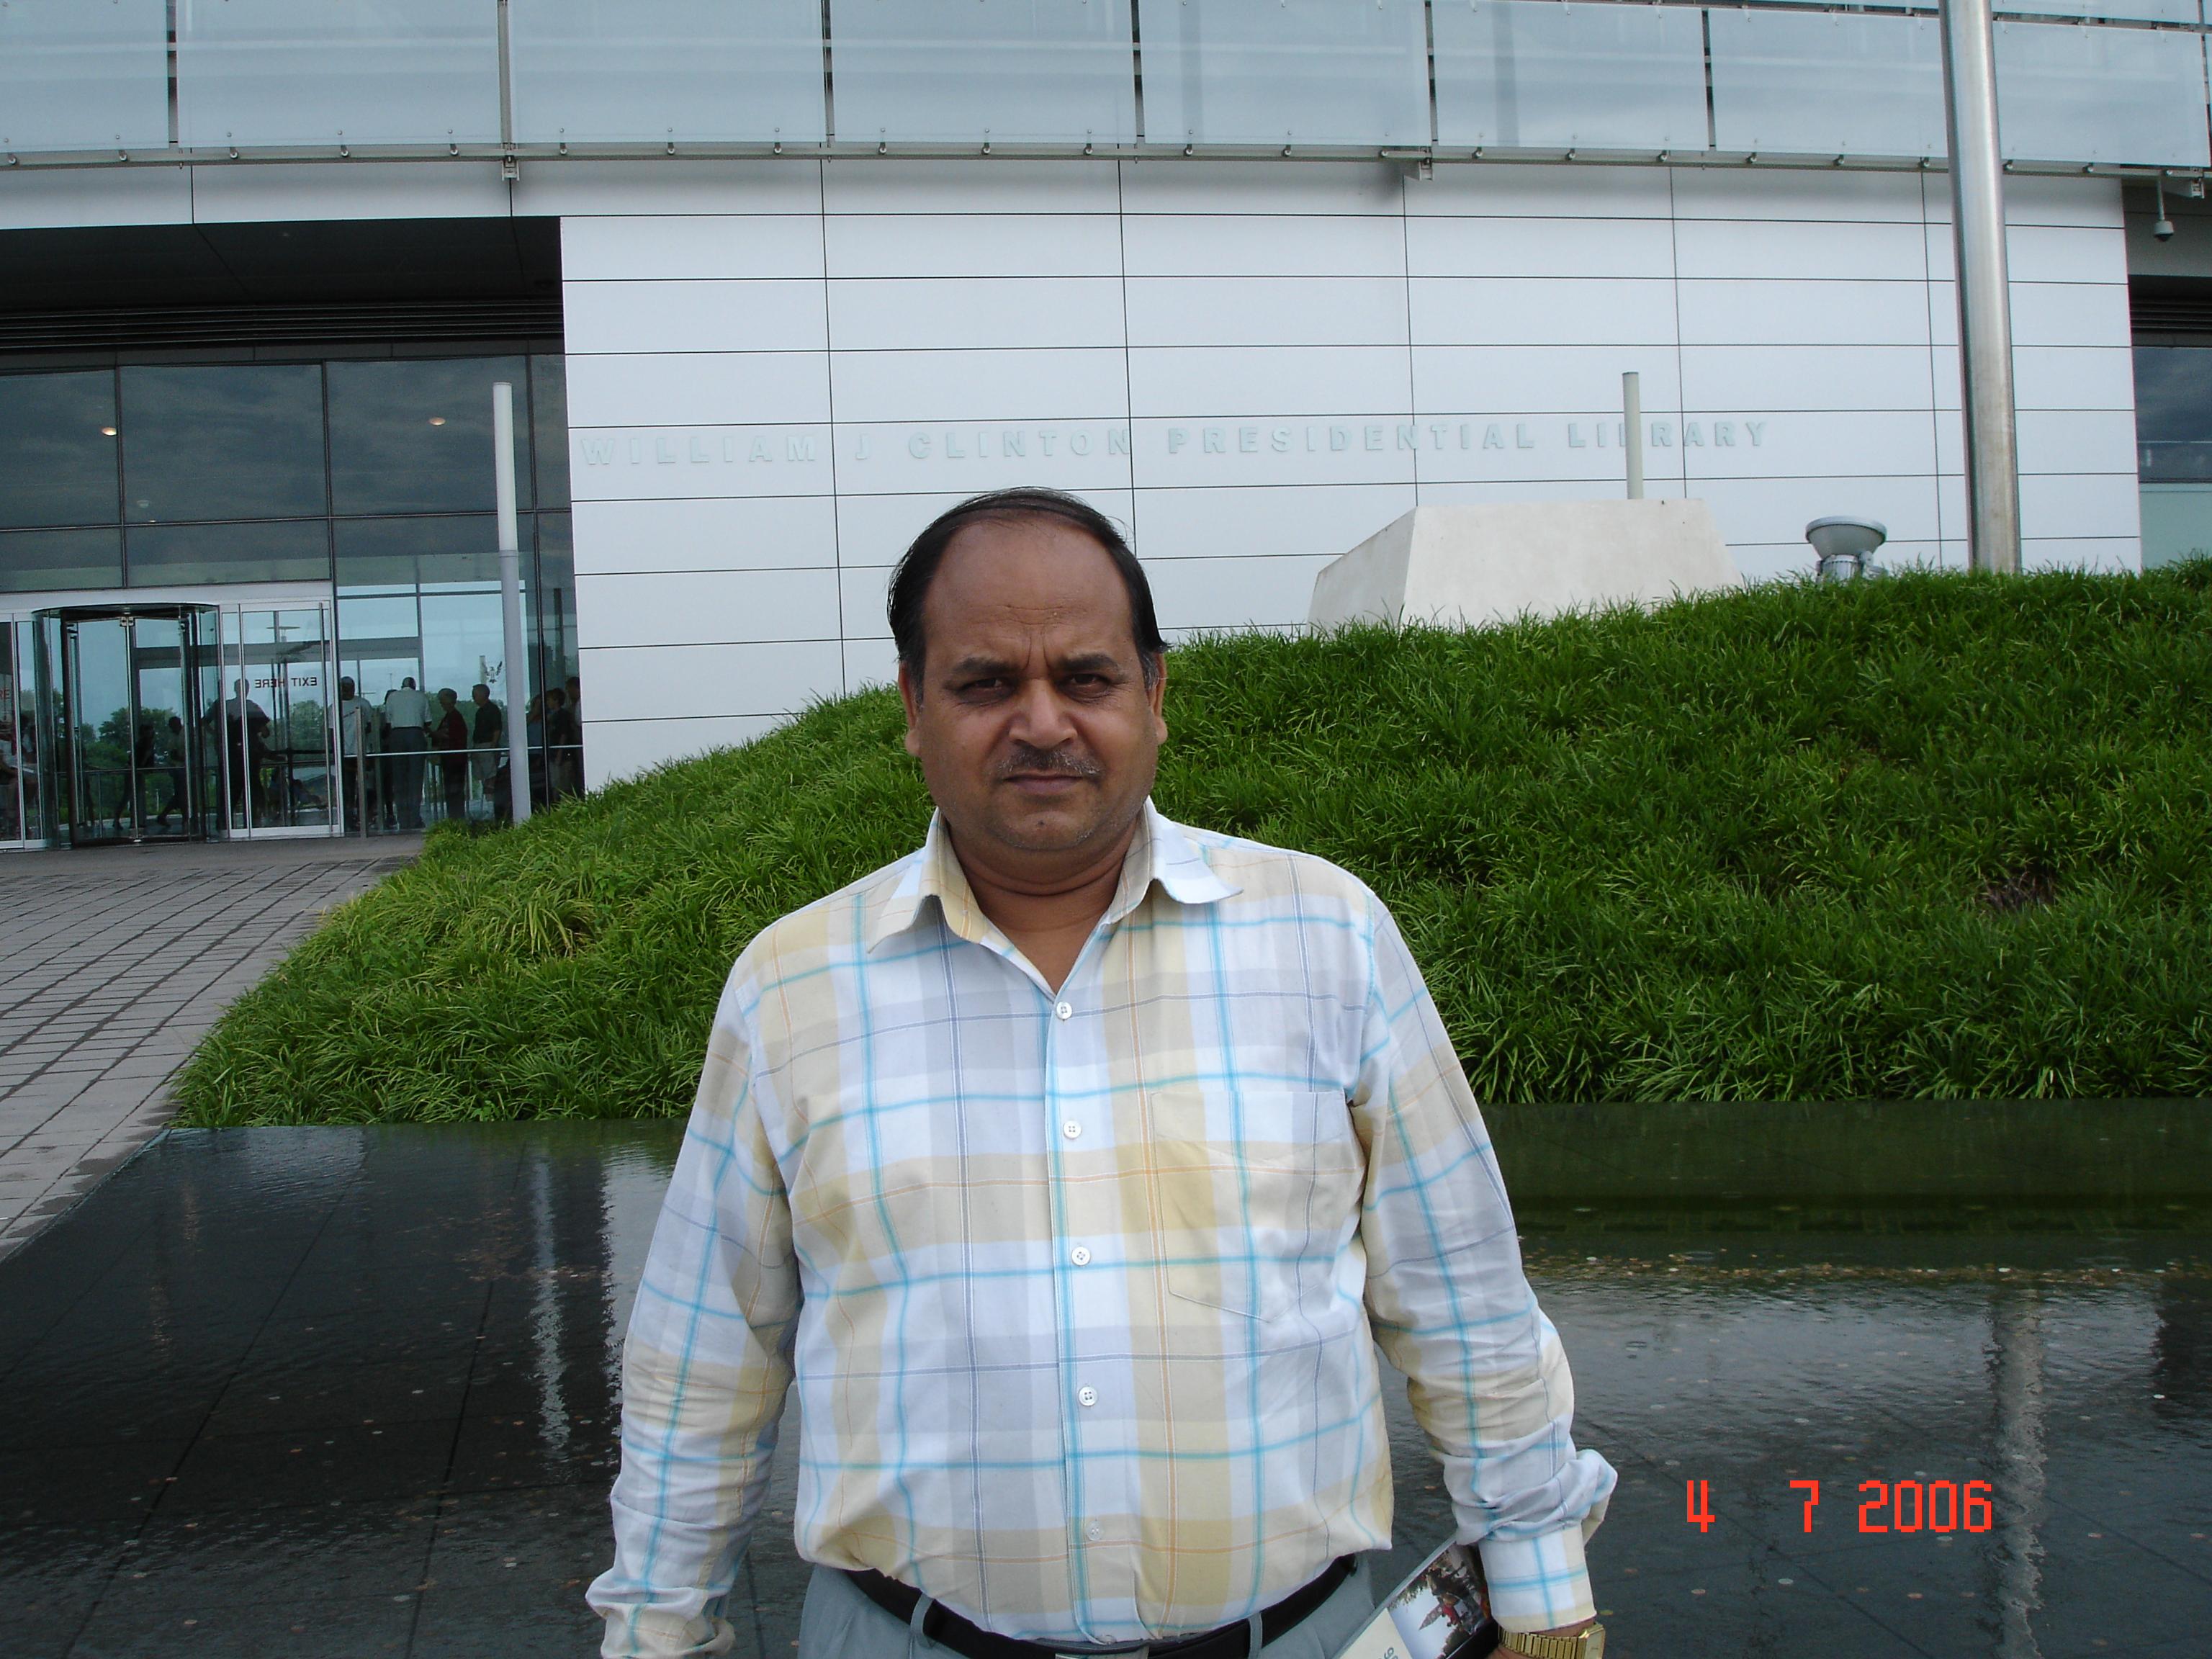 Profile image of Raghava, Dr. Gajendra Pal Singh